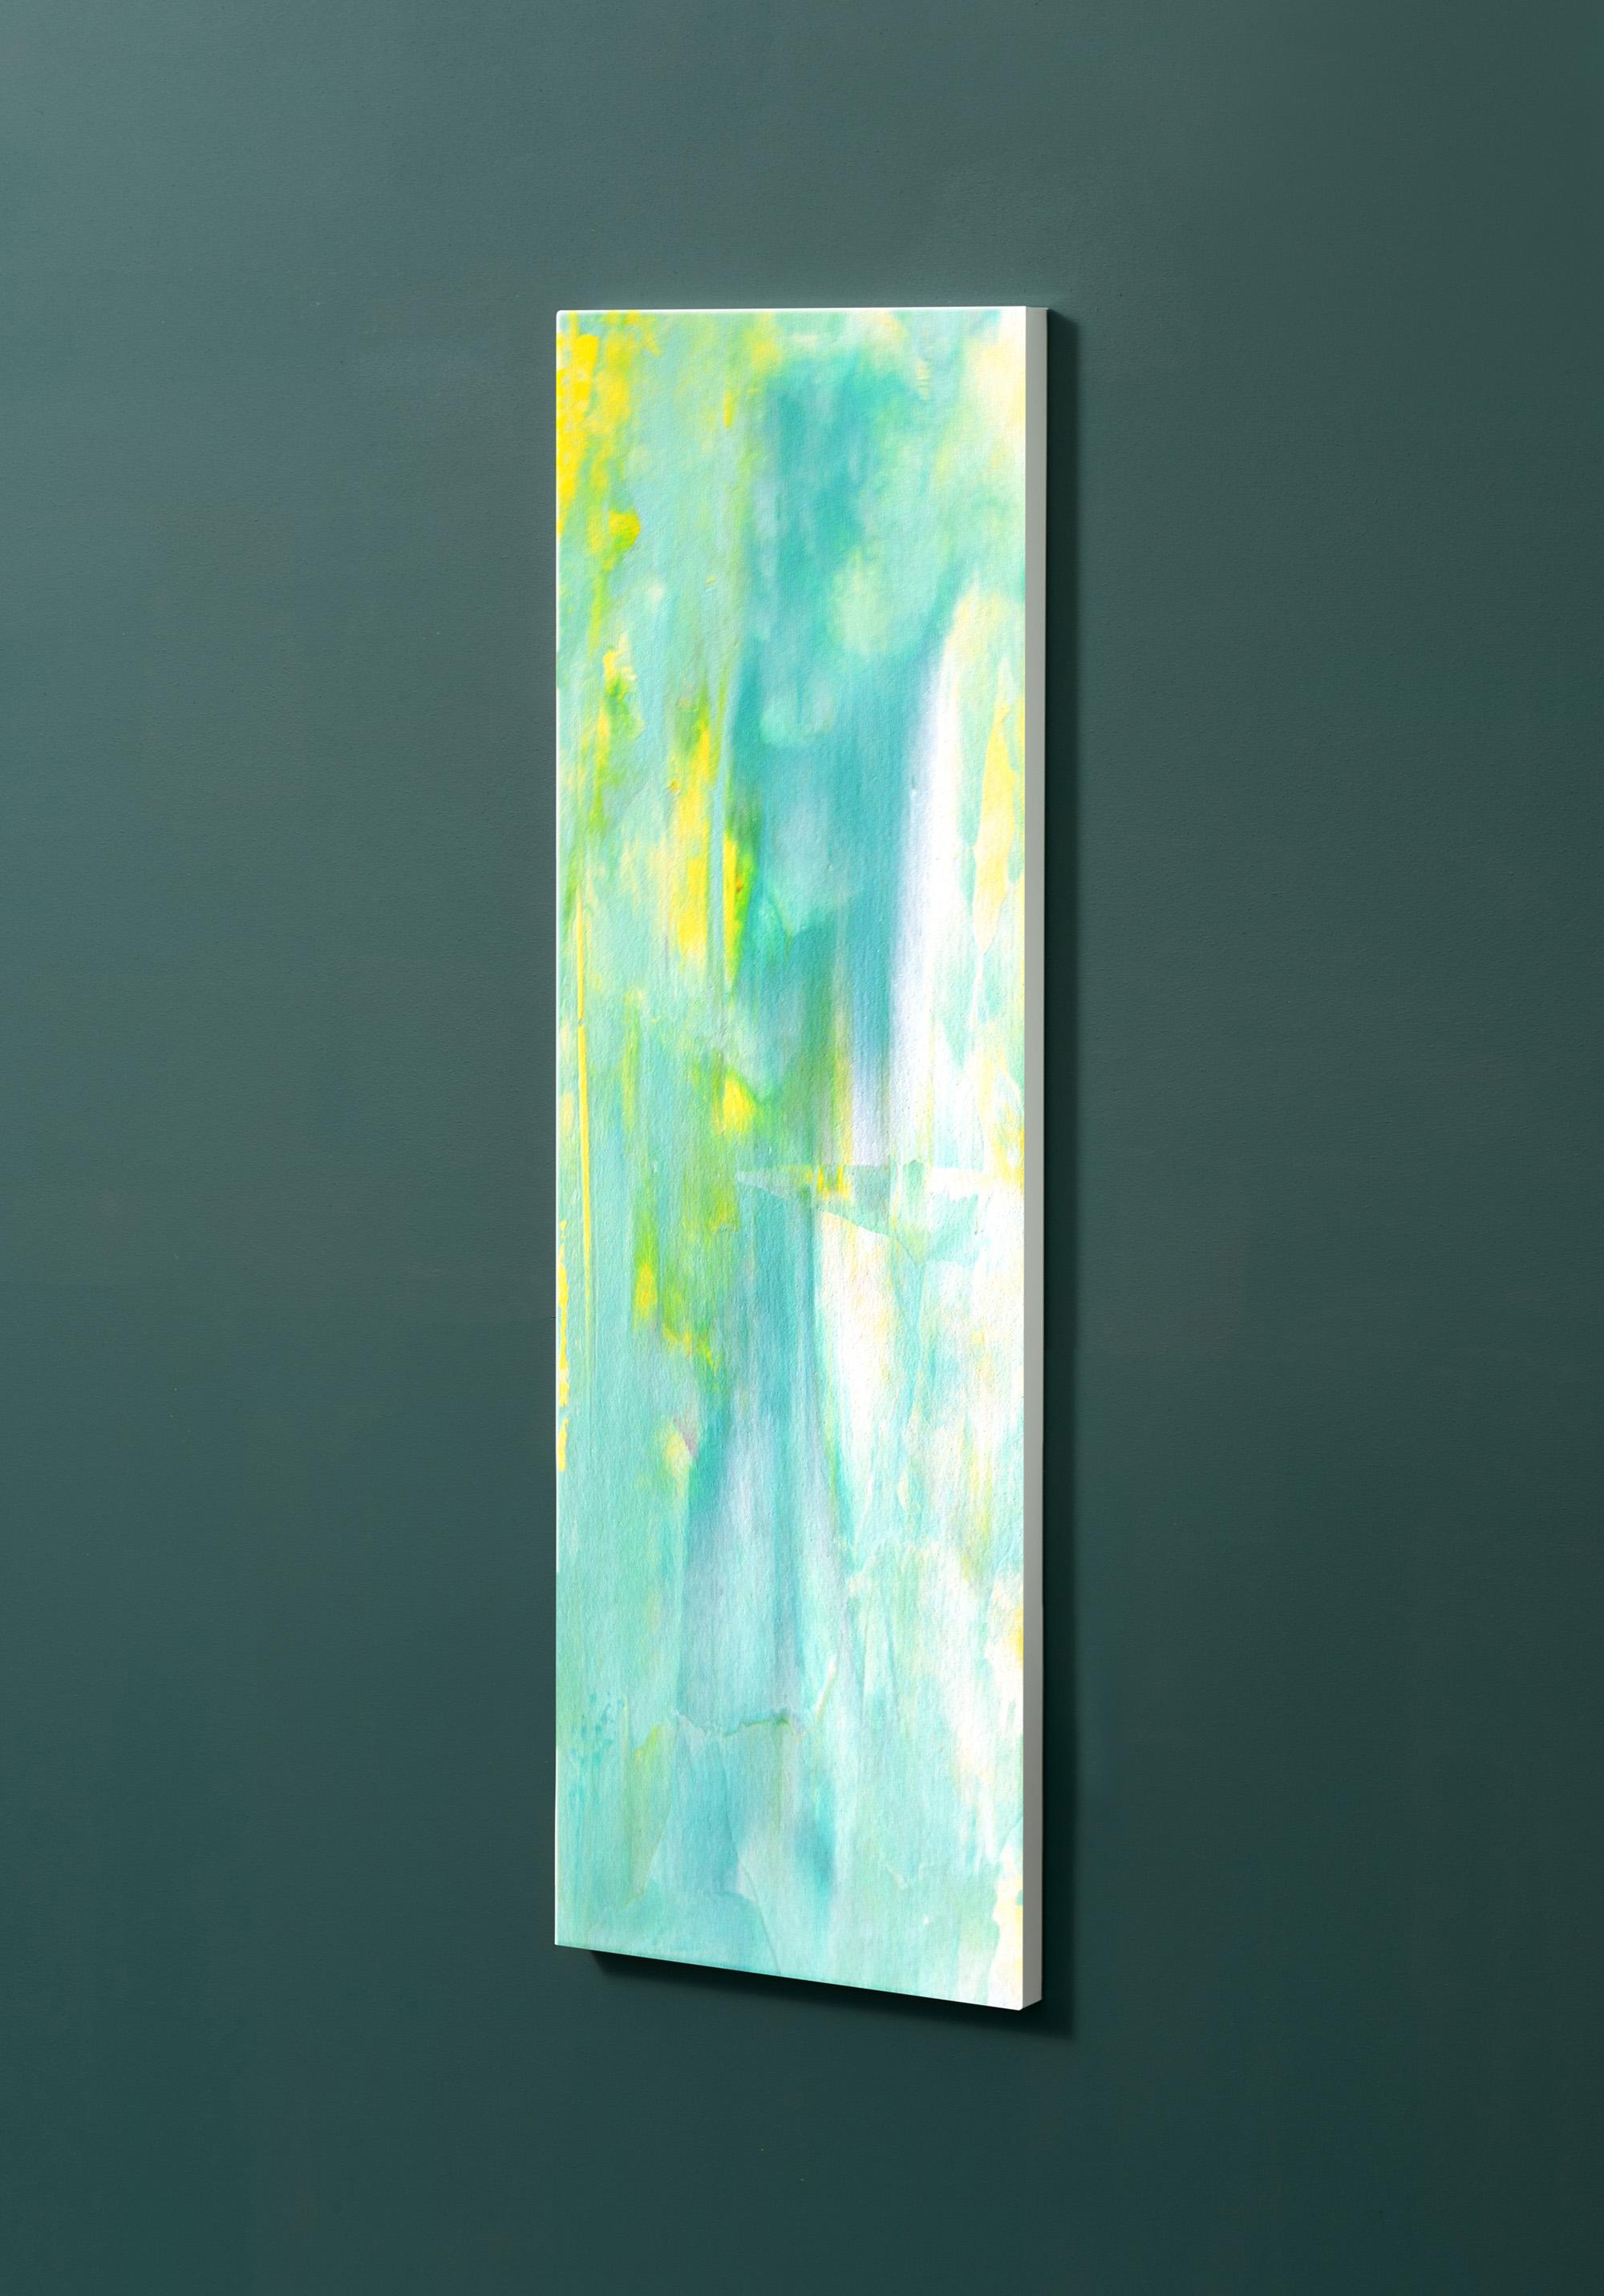 Magnettafel NOTIZ 30x90cm Motiv-Pinnwand M39 Abstrakt Kunst